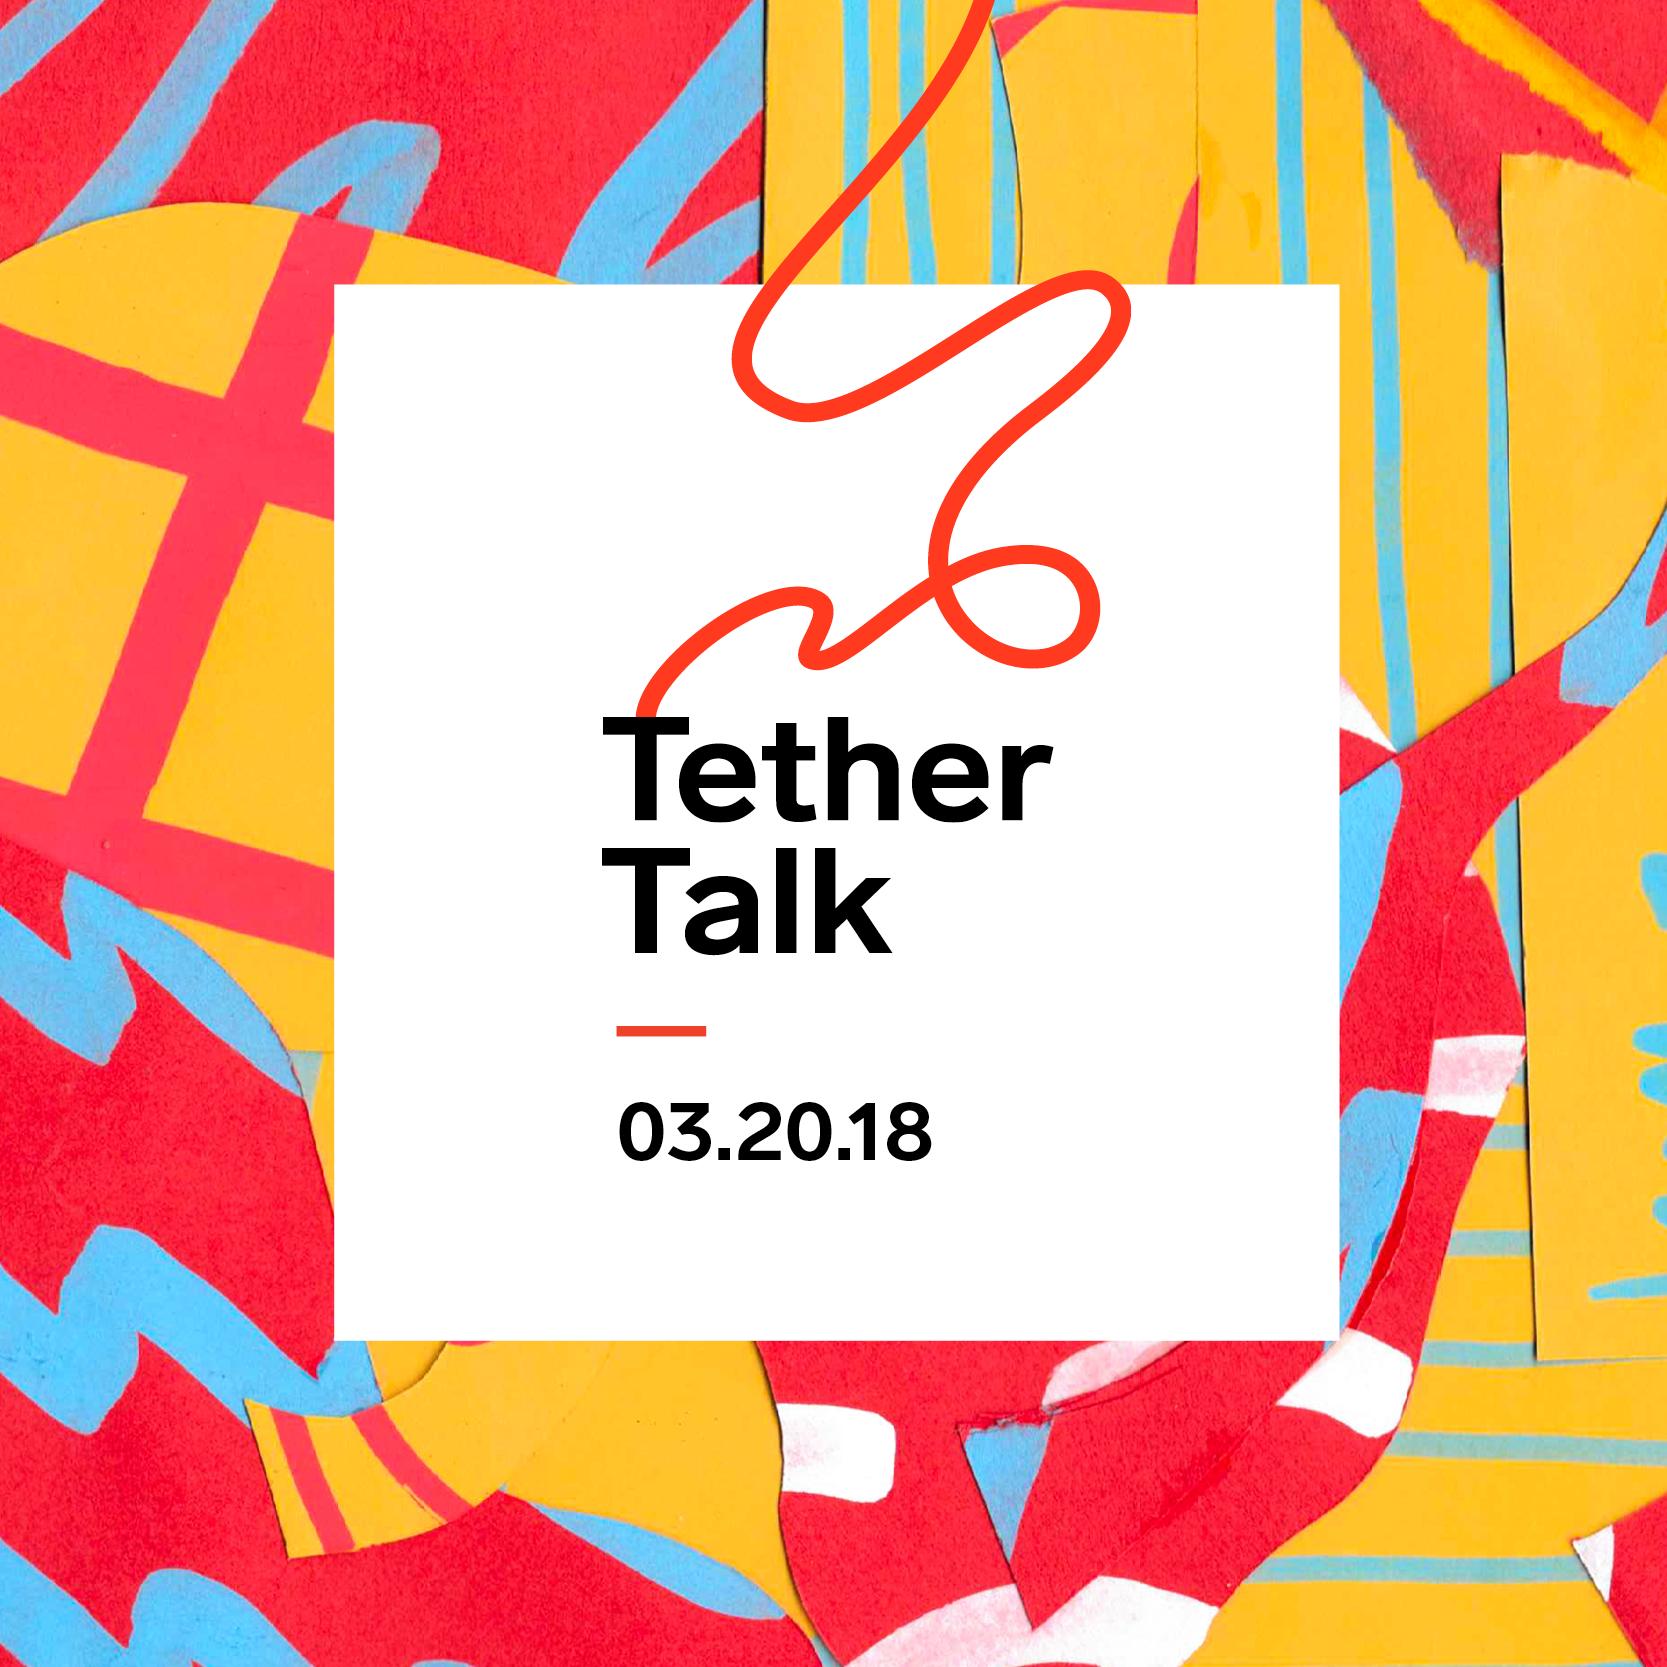 Tether Talk 1 - IG post.png